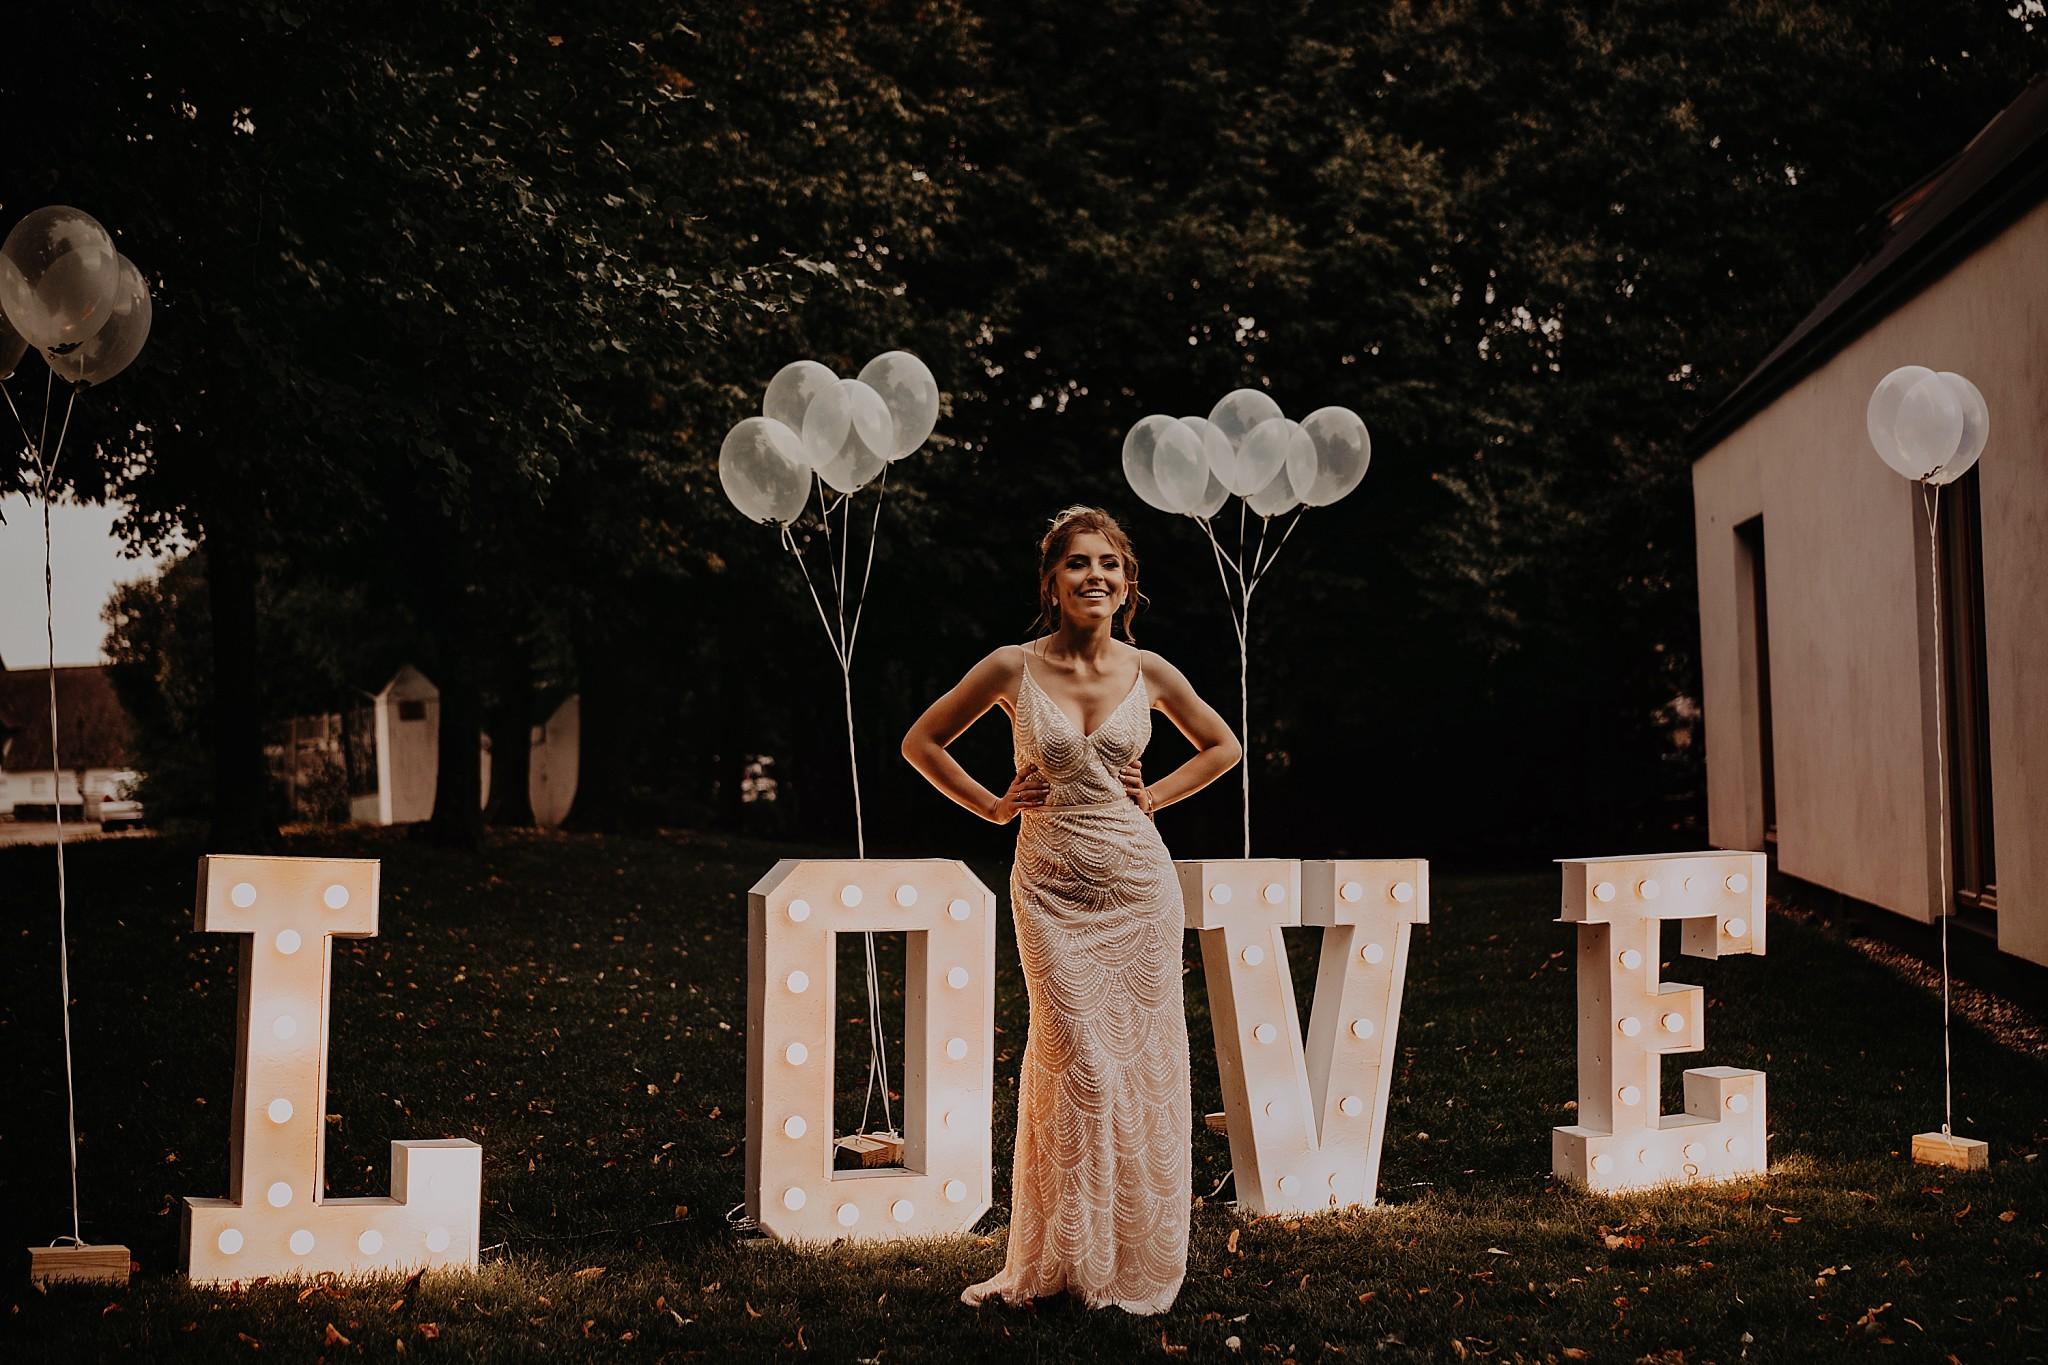 fotograf poznan wesele dobra truskawka piekne wesele pod poznaniem wesele w dobrej truskawce piekna para mloda slub marzen slub koronawirus slub listopad wesele koronawirus 360